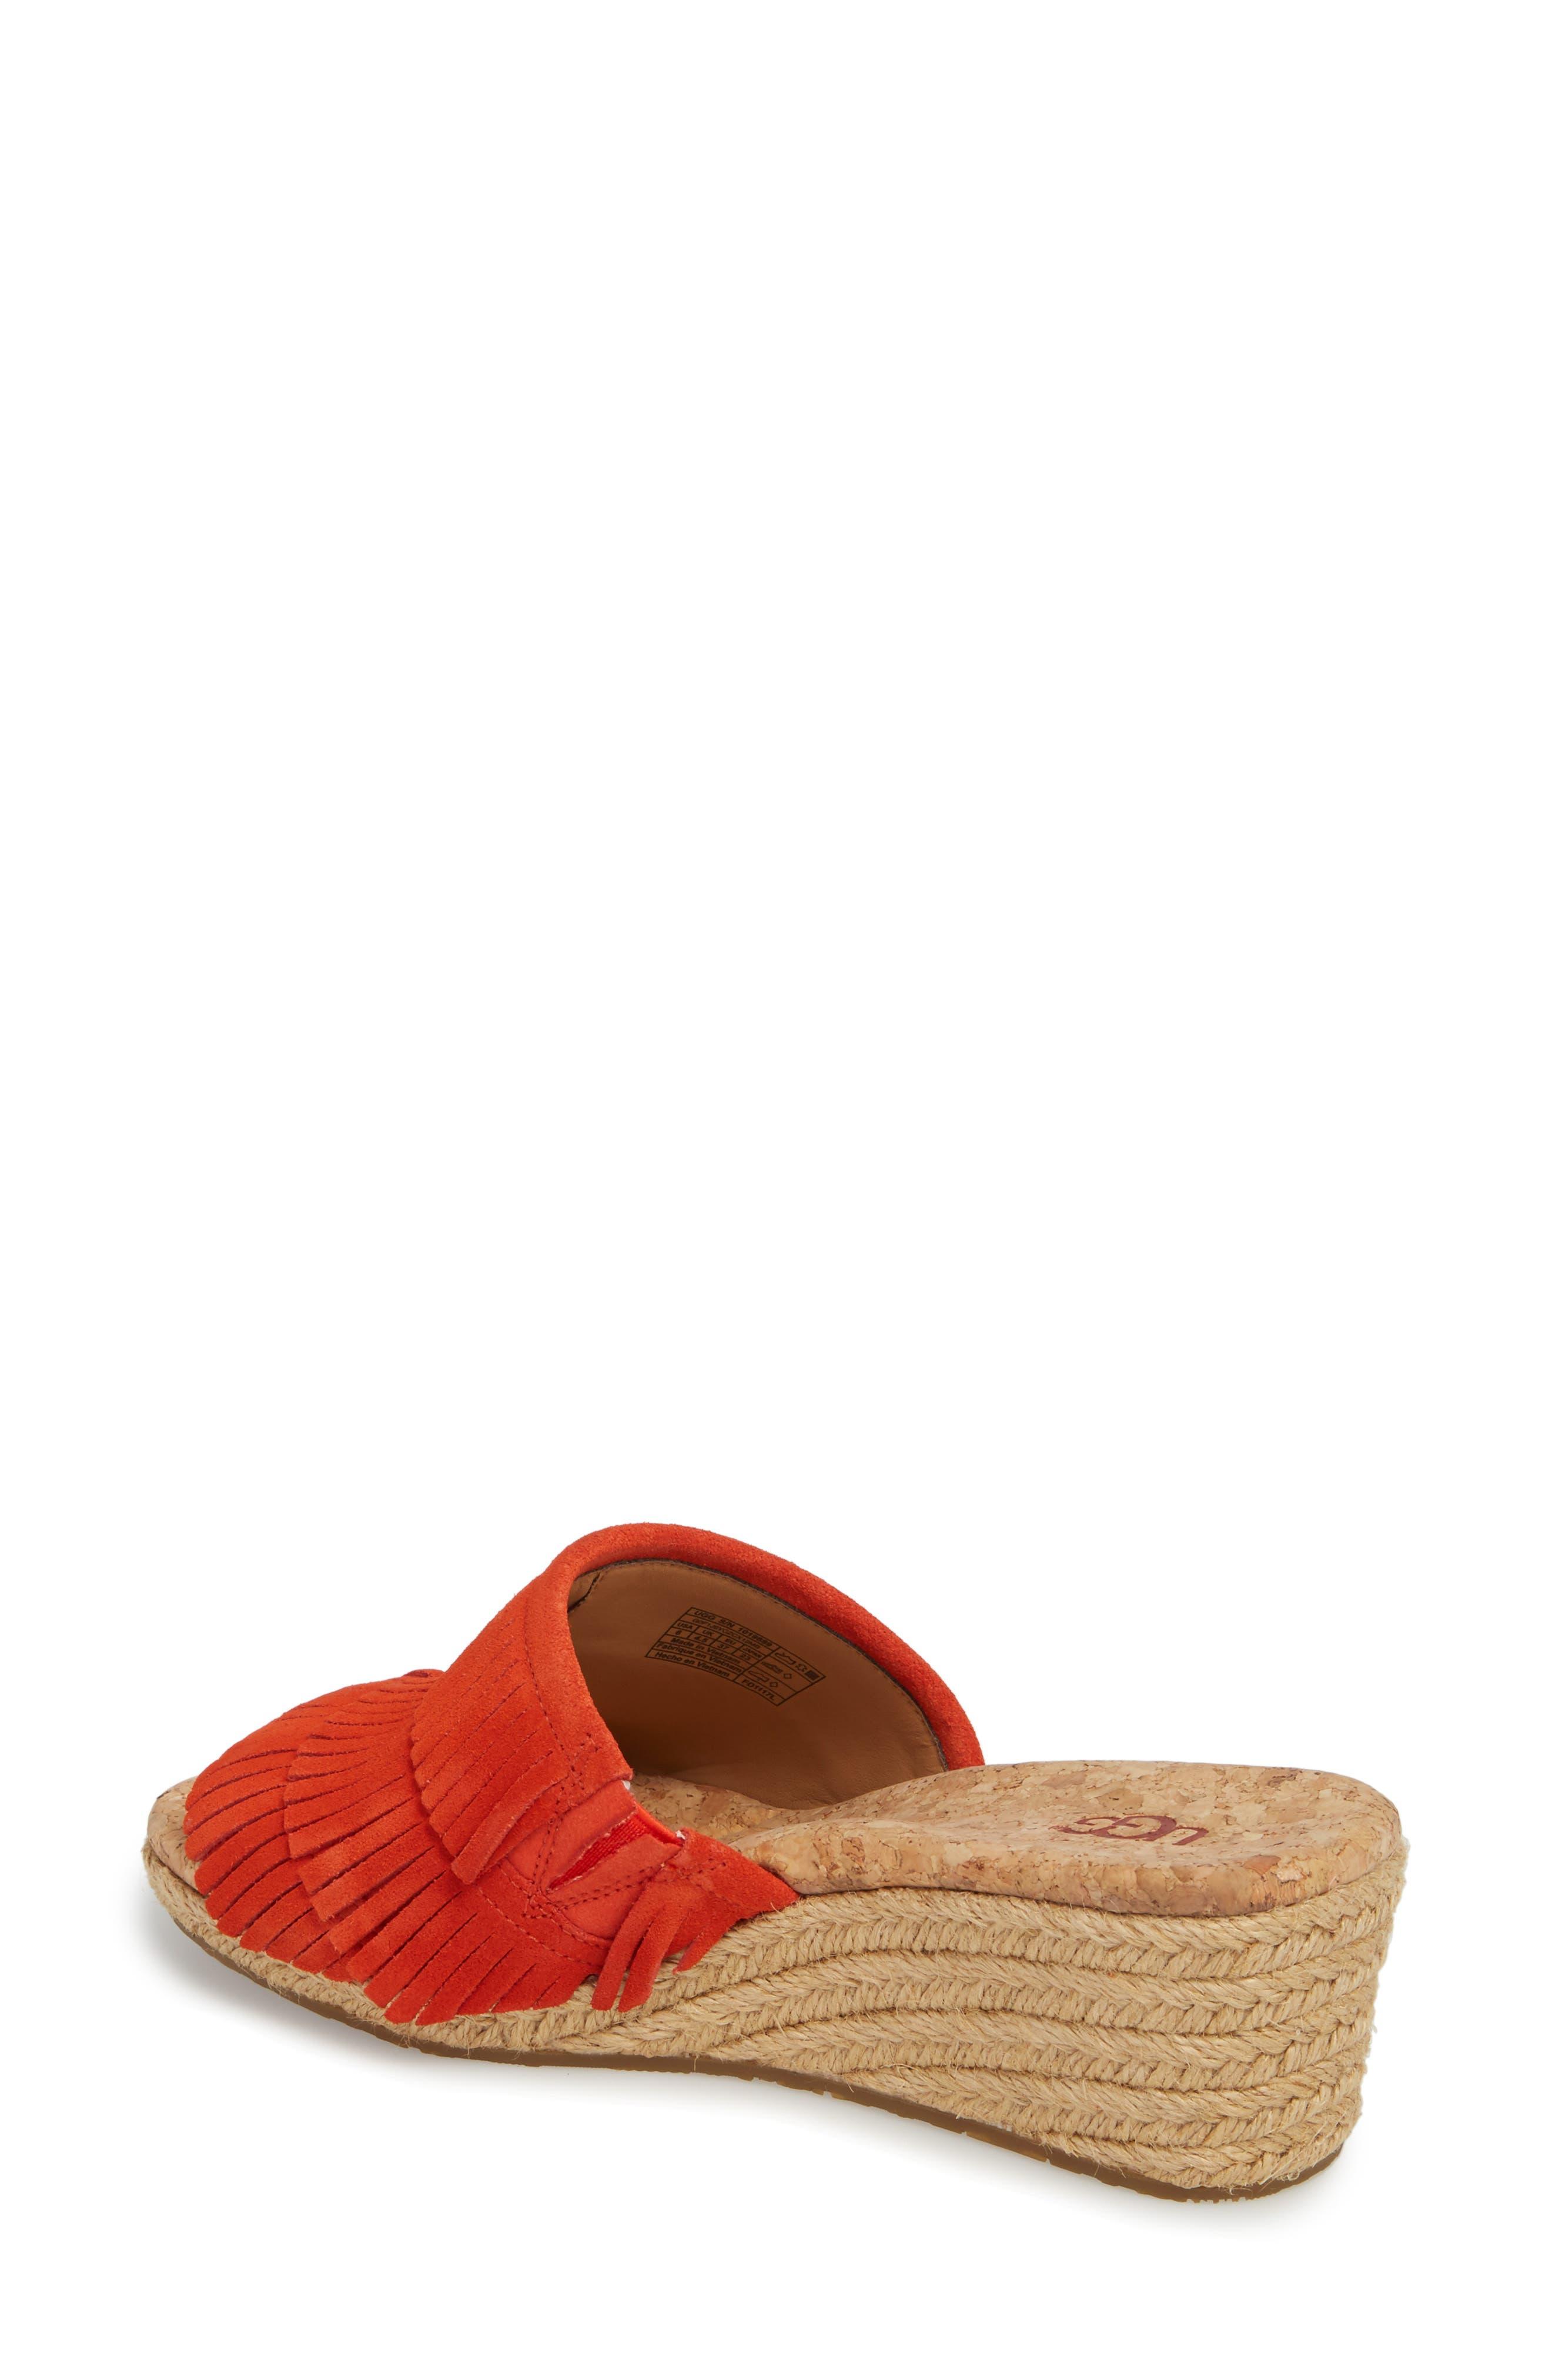 Kendra Fringe Wedge Sandal,                             Alternate thumbnail 2, color,                             Red Orange